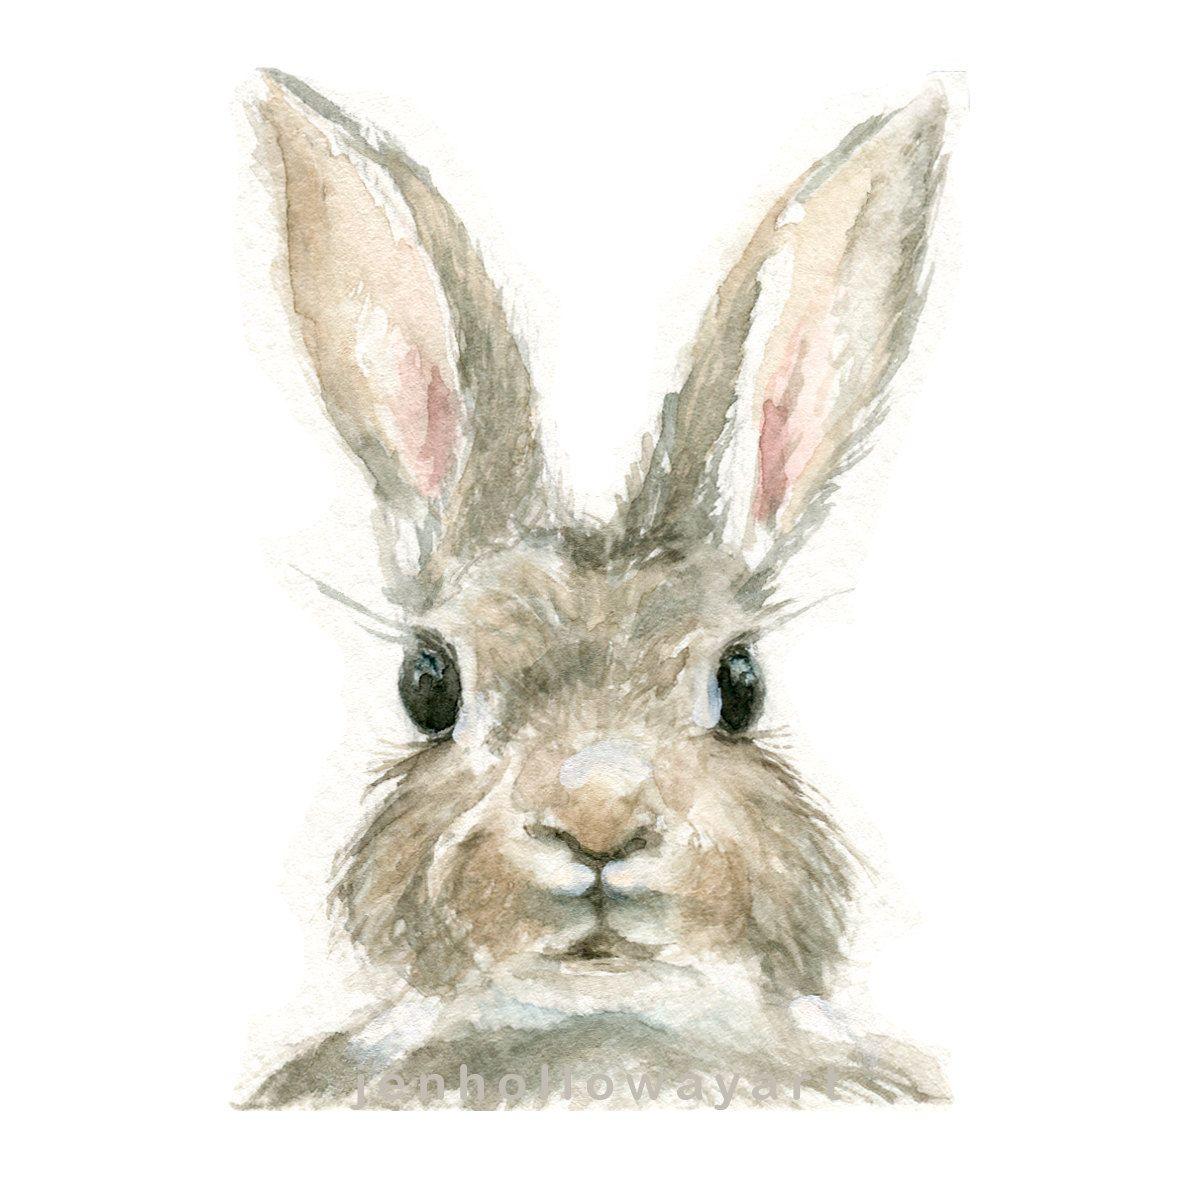 1200x1200 Watercolor Rabbit, Rabbit Print, Bunny Print, Animal Print, Rabbit